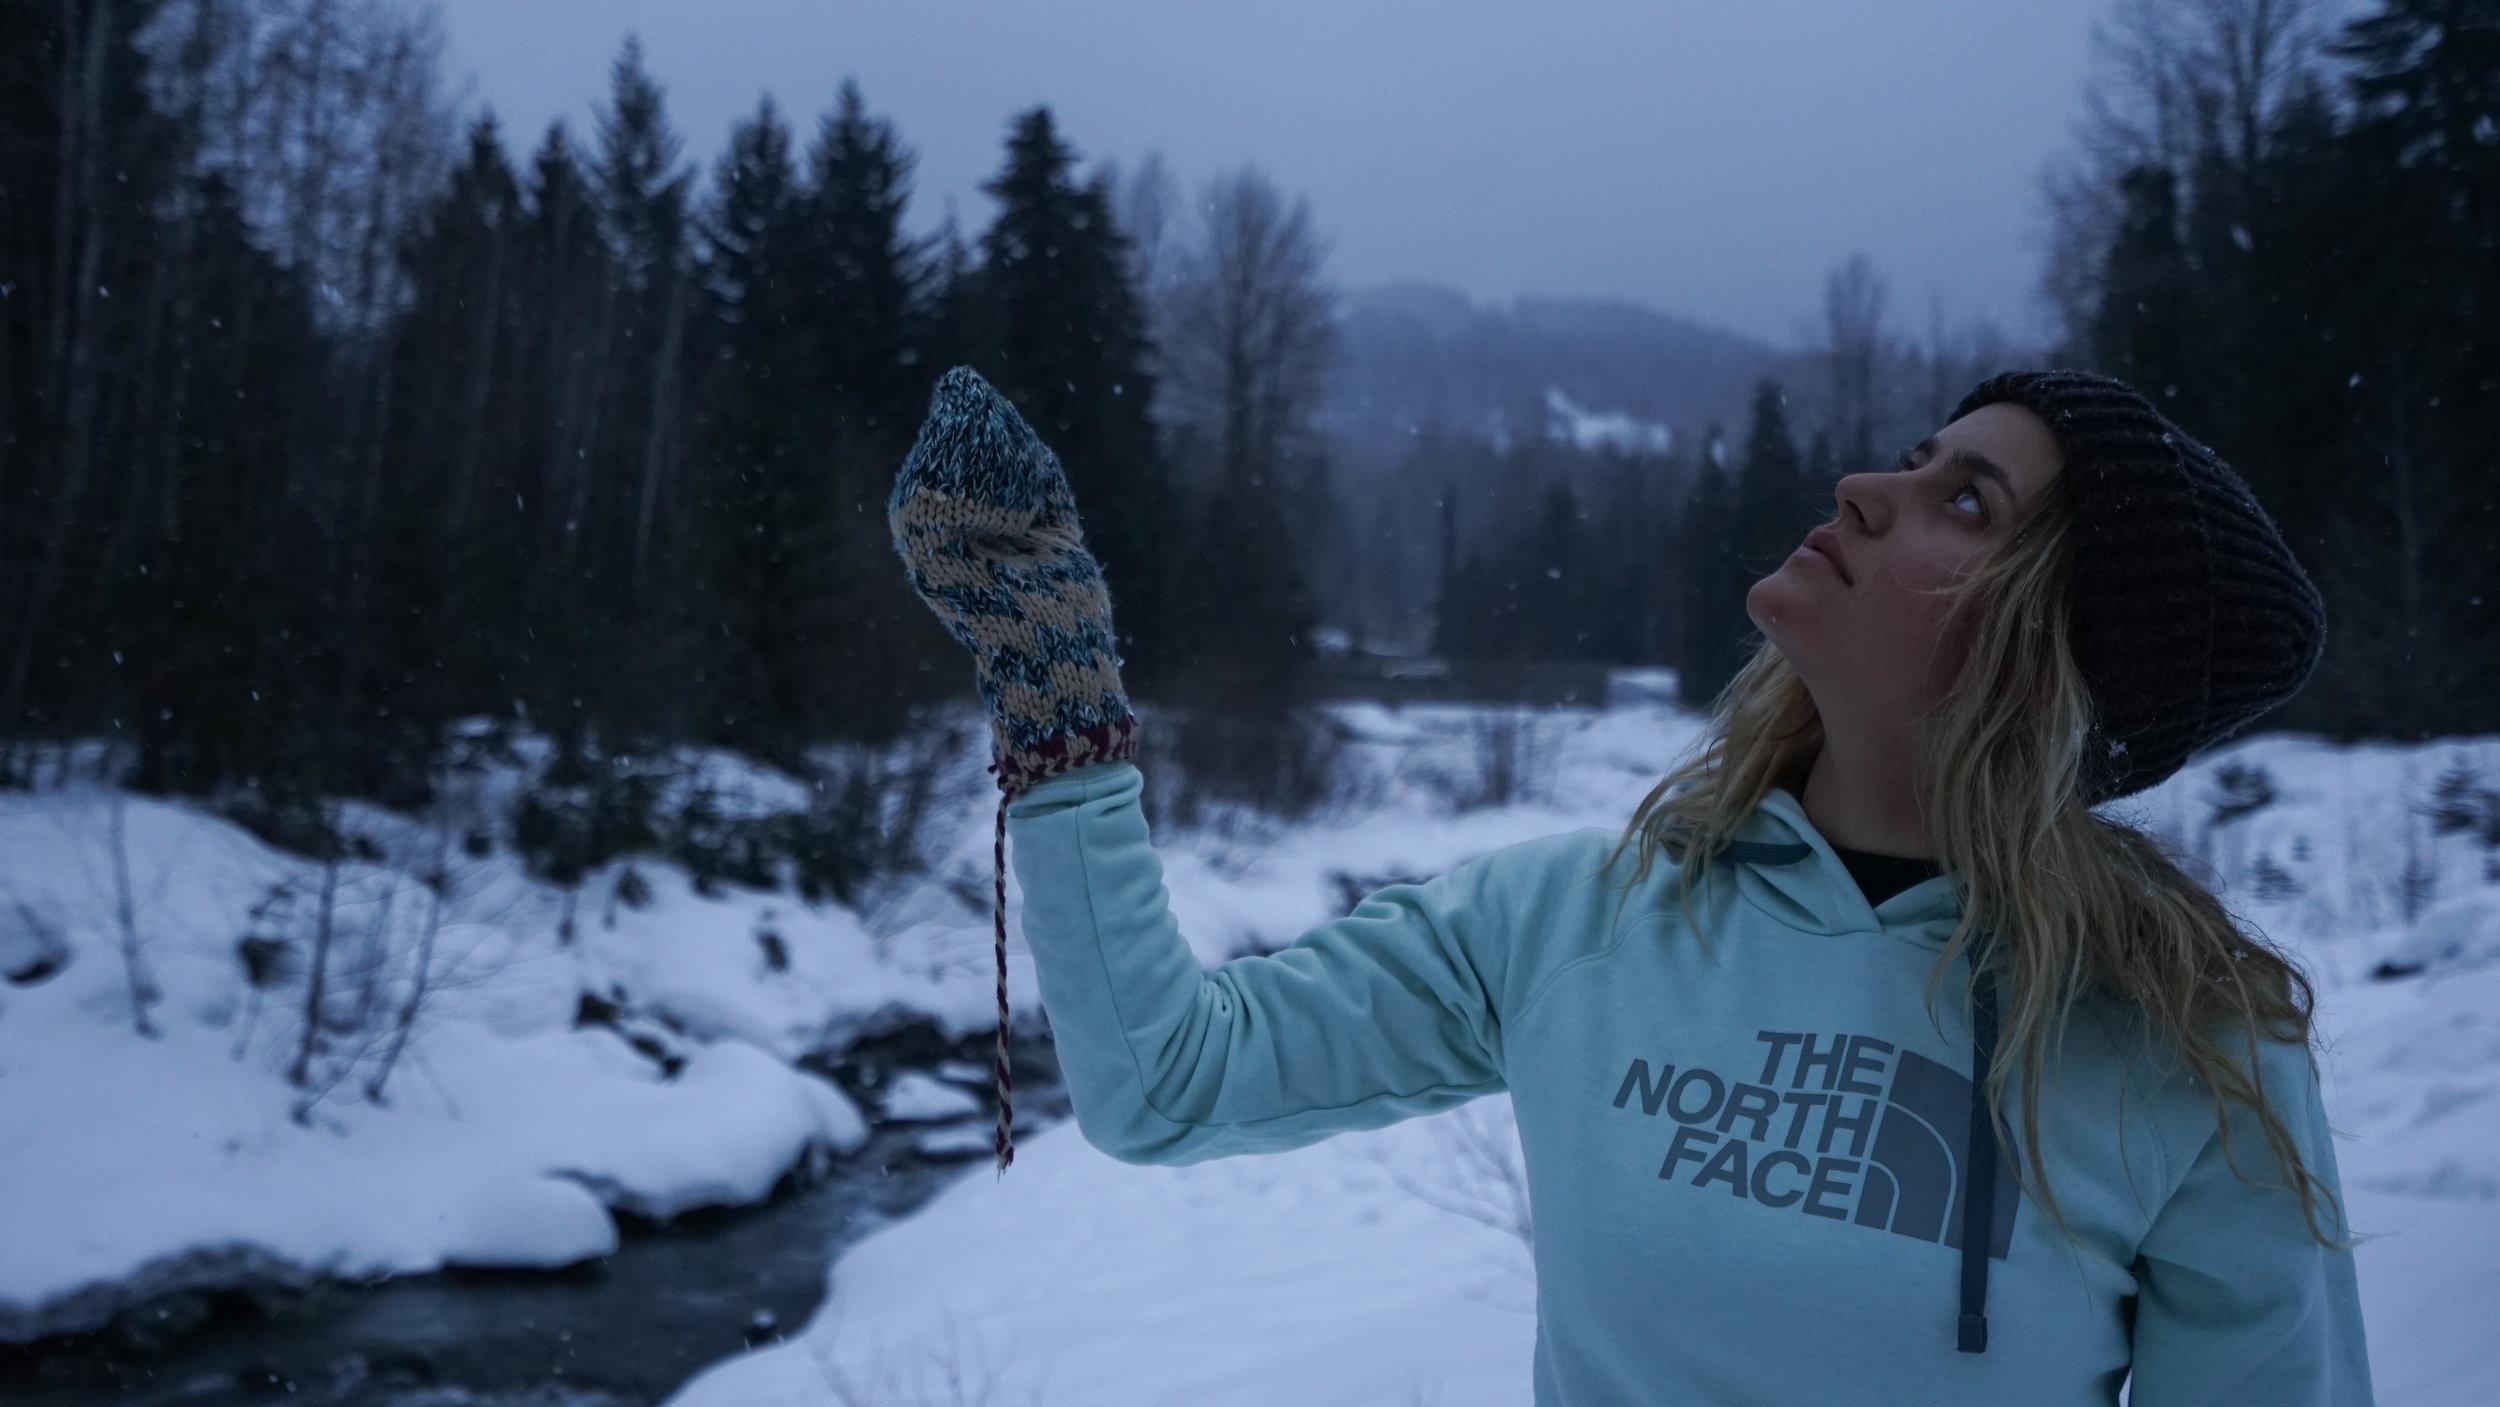 Owl House Creative - North Face Whistler Blackcomb Campaign